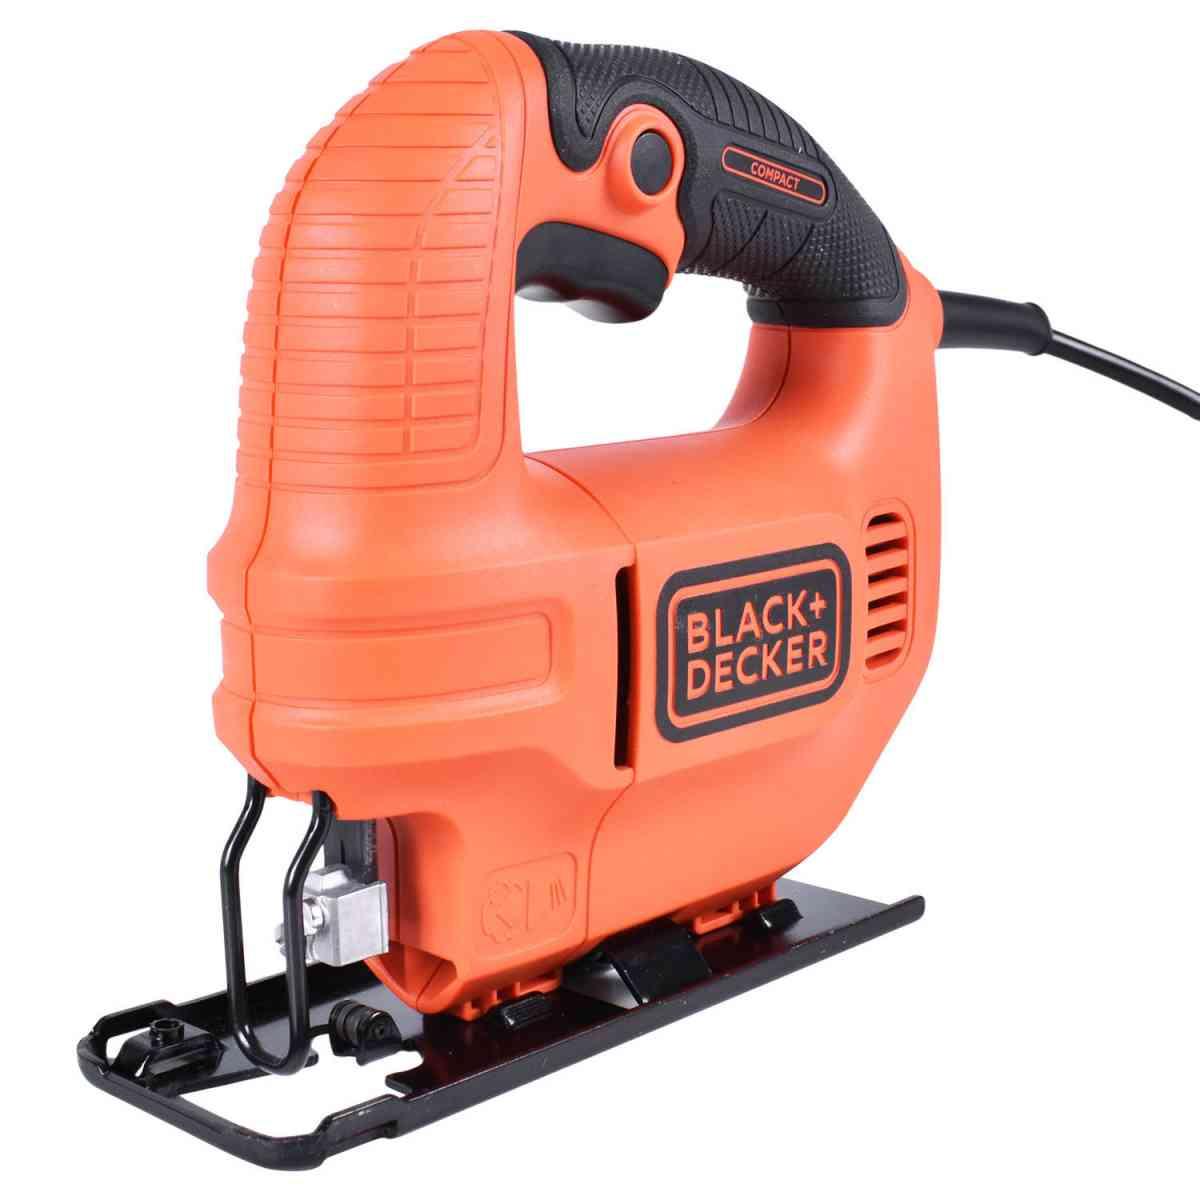 SERRA TICO TICO 420W BLACK AND DECKER KS501